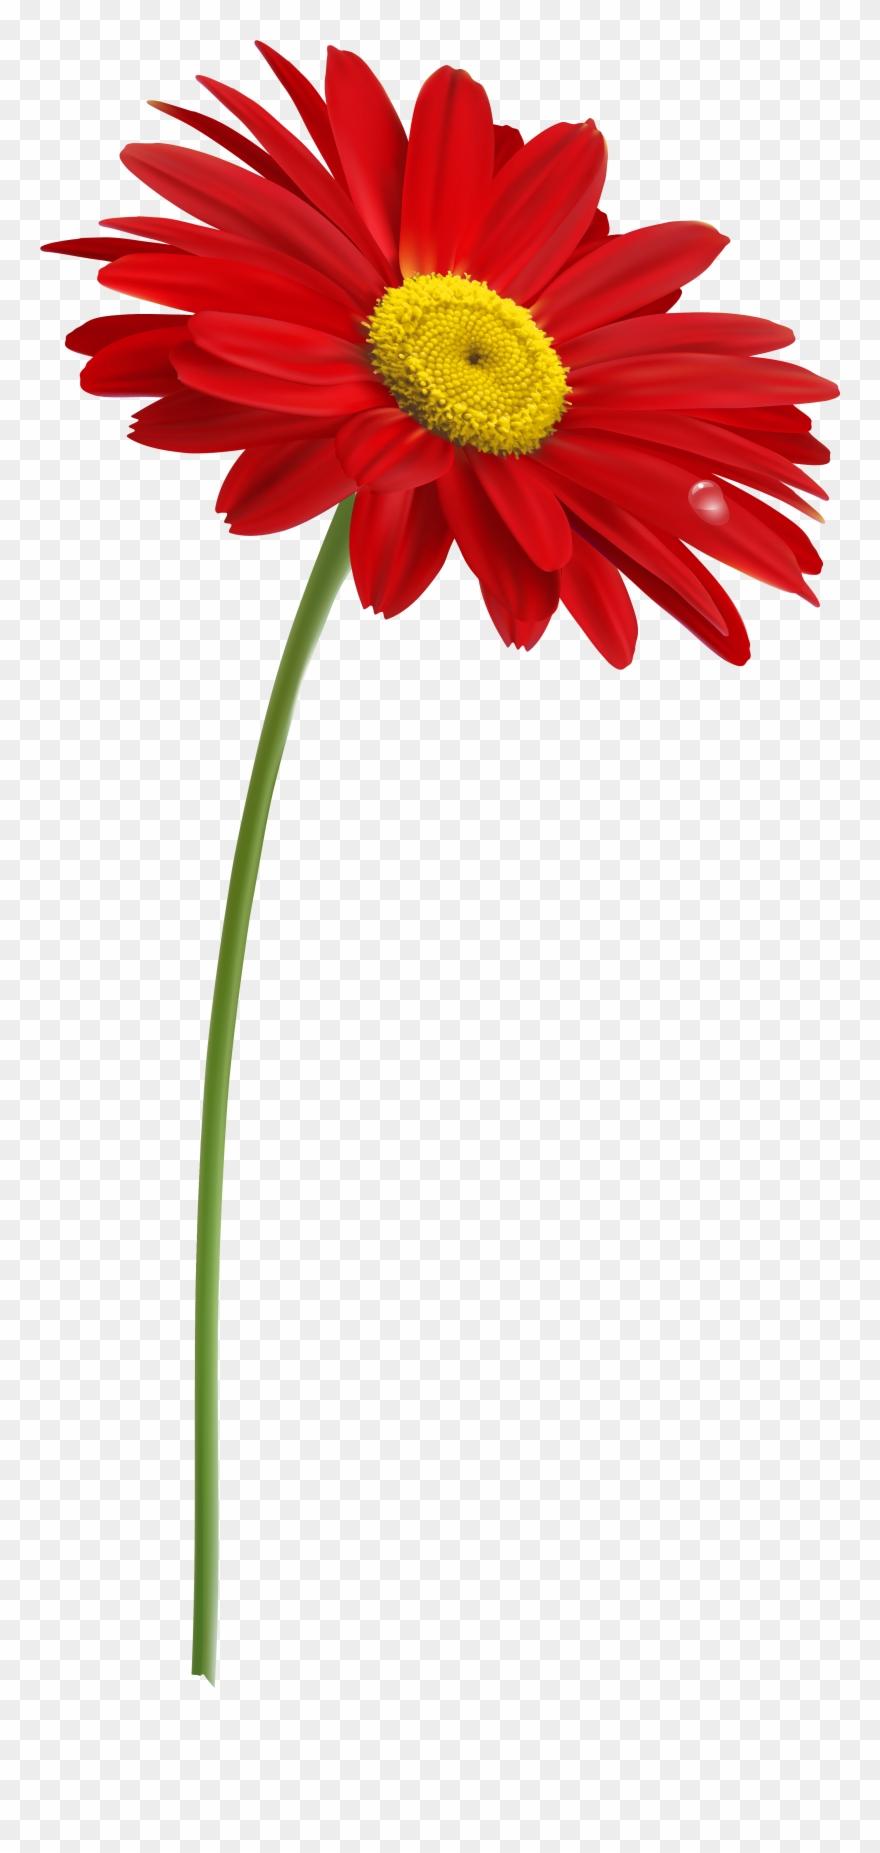 Stem Flower Clip Art With Transparent Background.